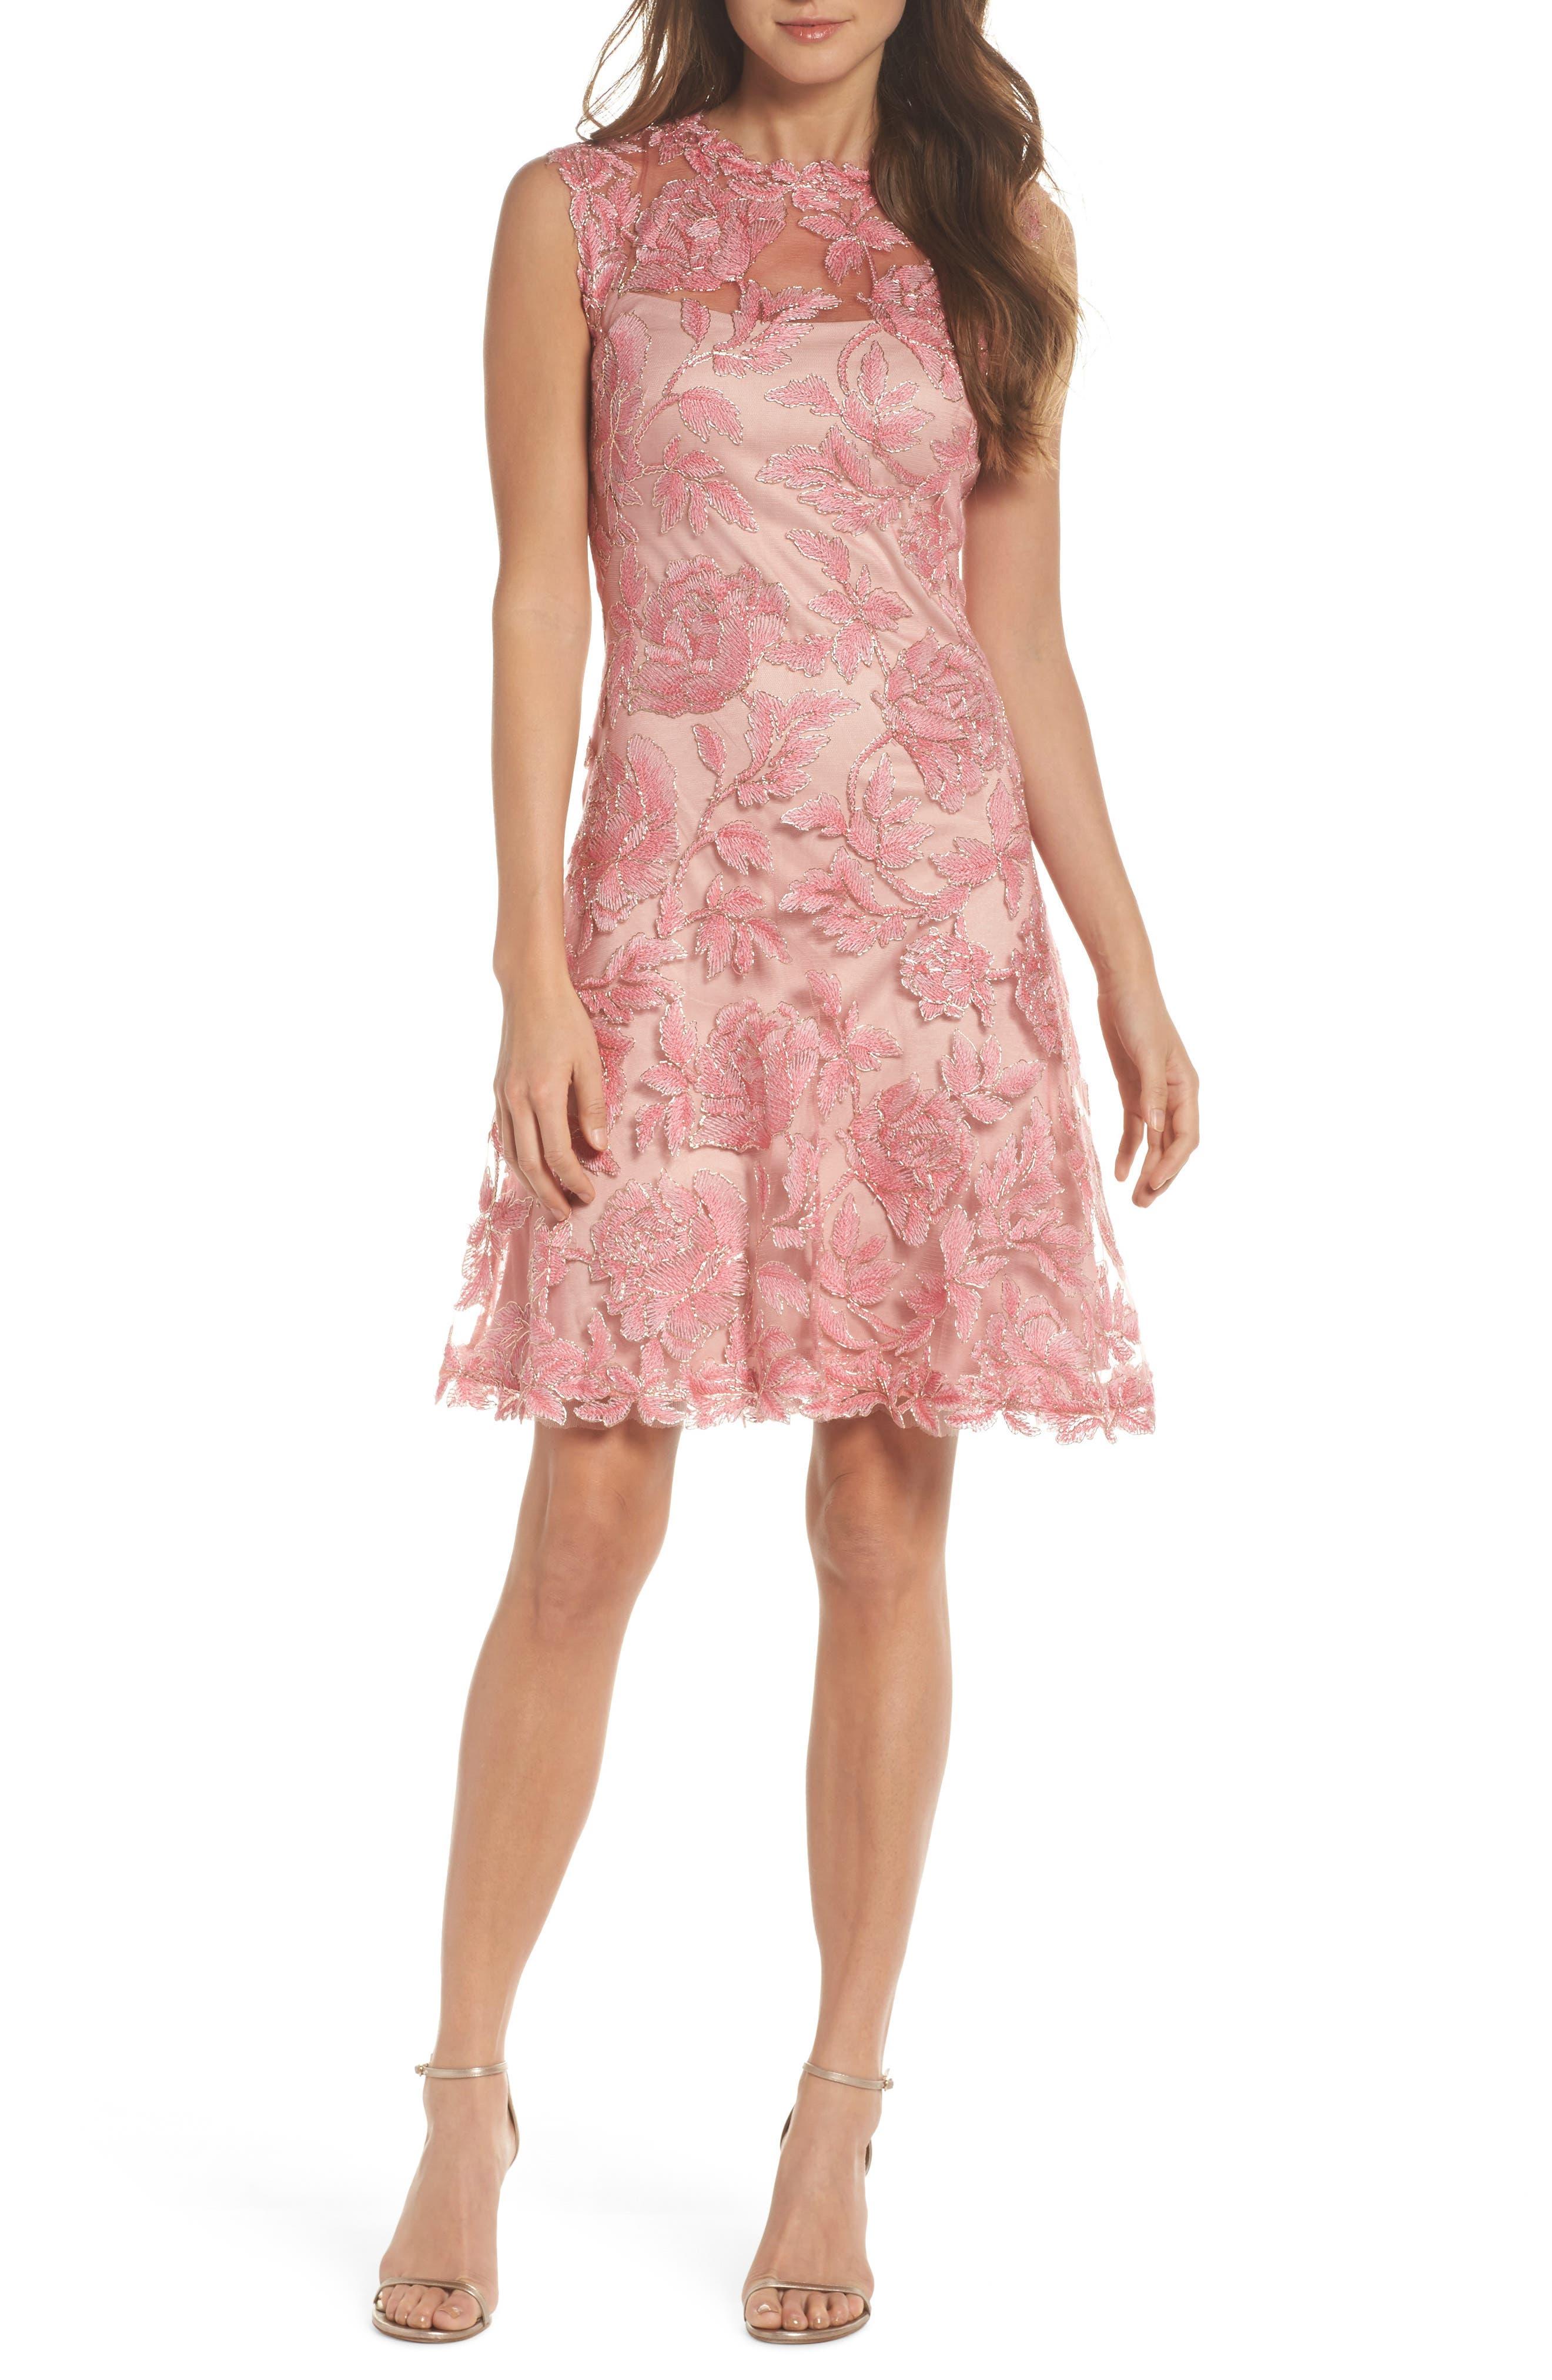 Alternate Image 1 Selected - Tadashi Shoji Noelle Floral Fit & Flare Dress (Regular & Petite)